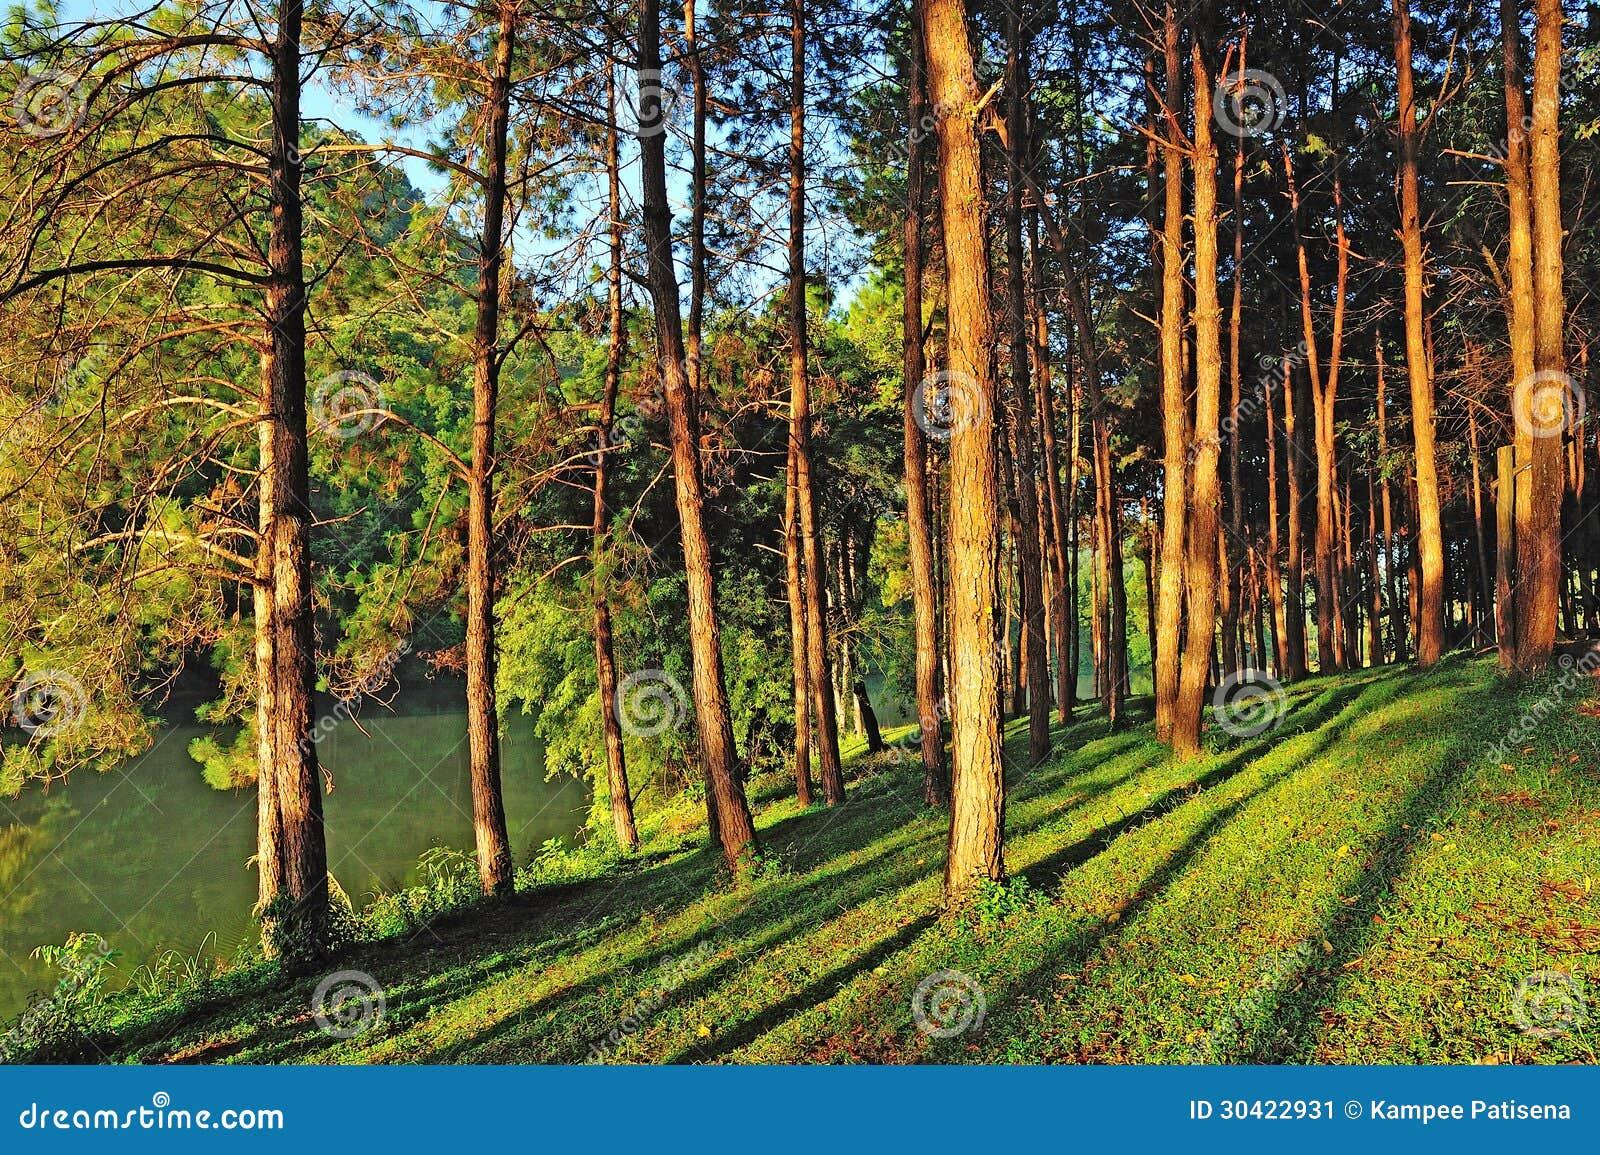 Pang Ung Forestry Plantations